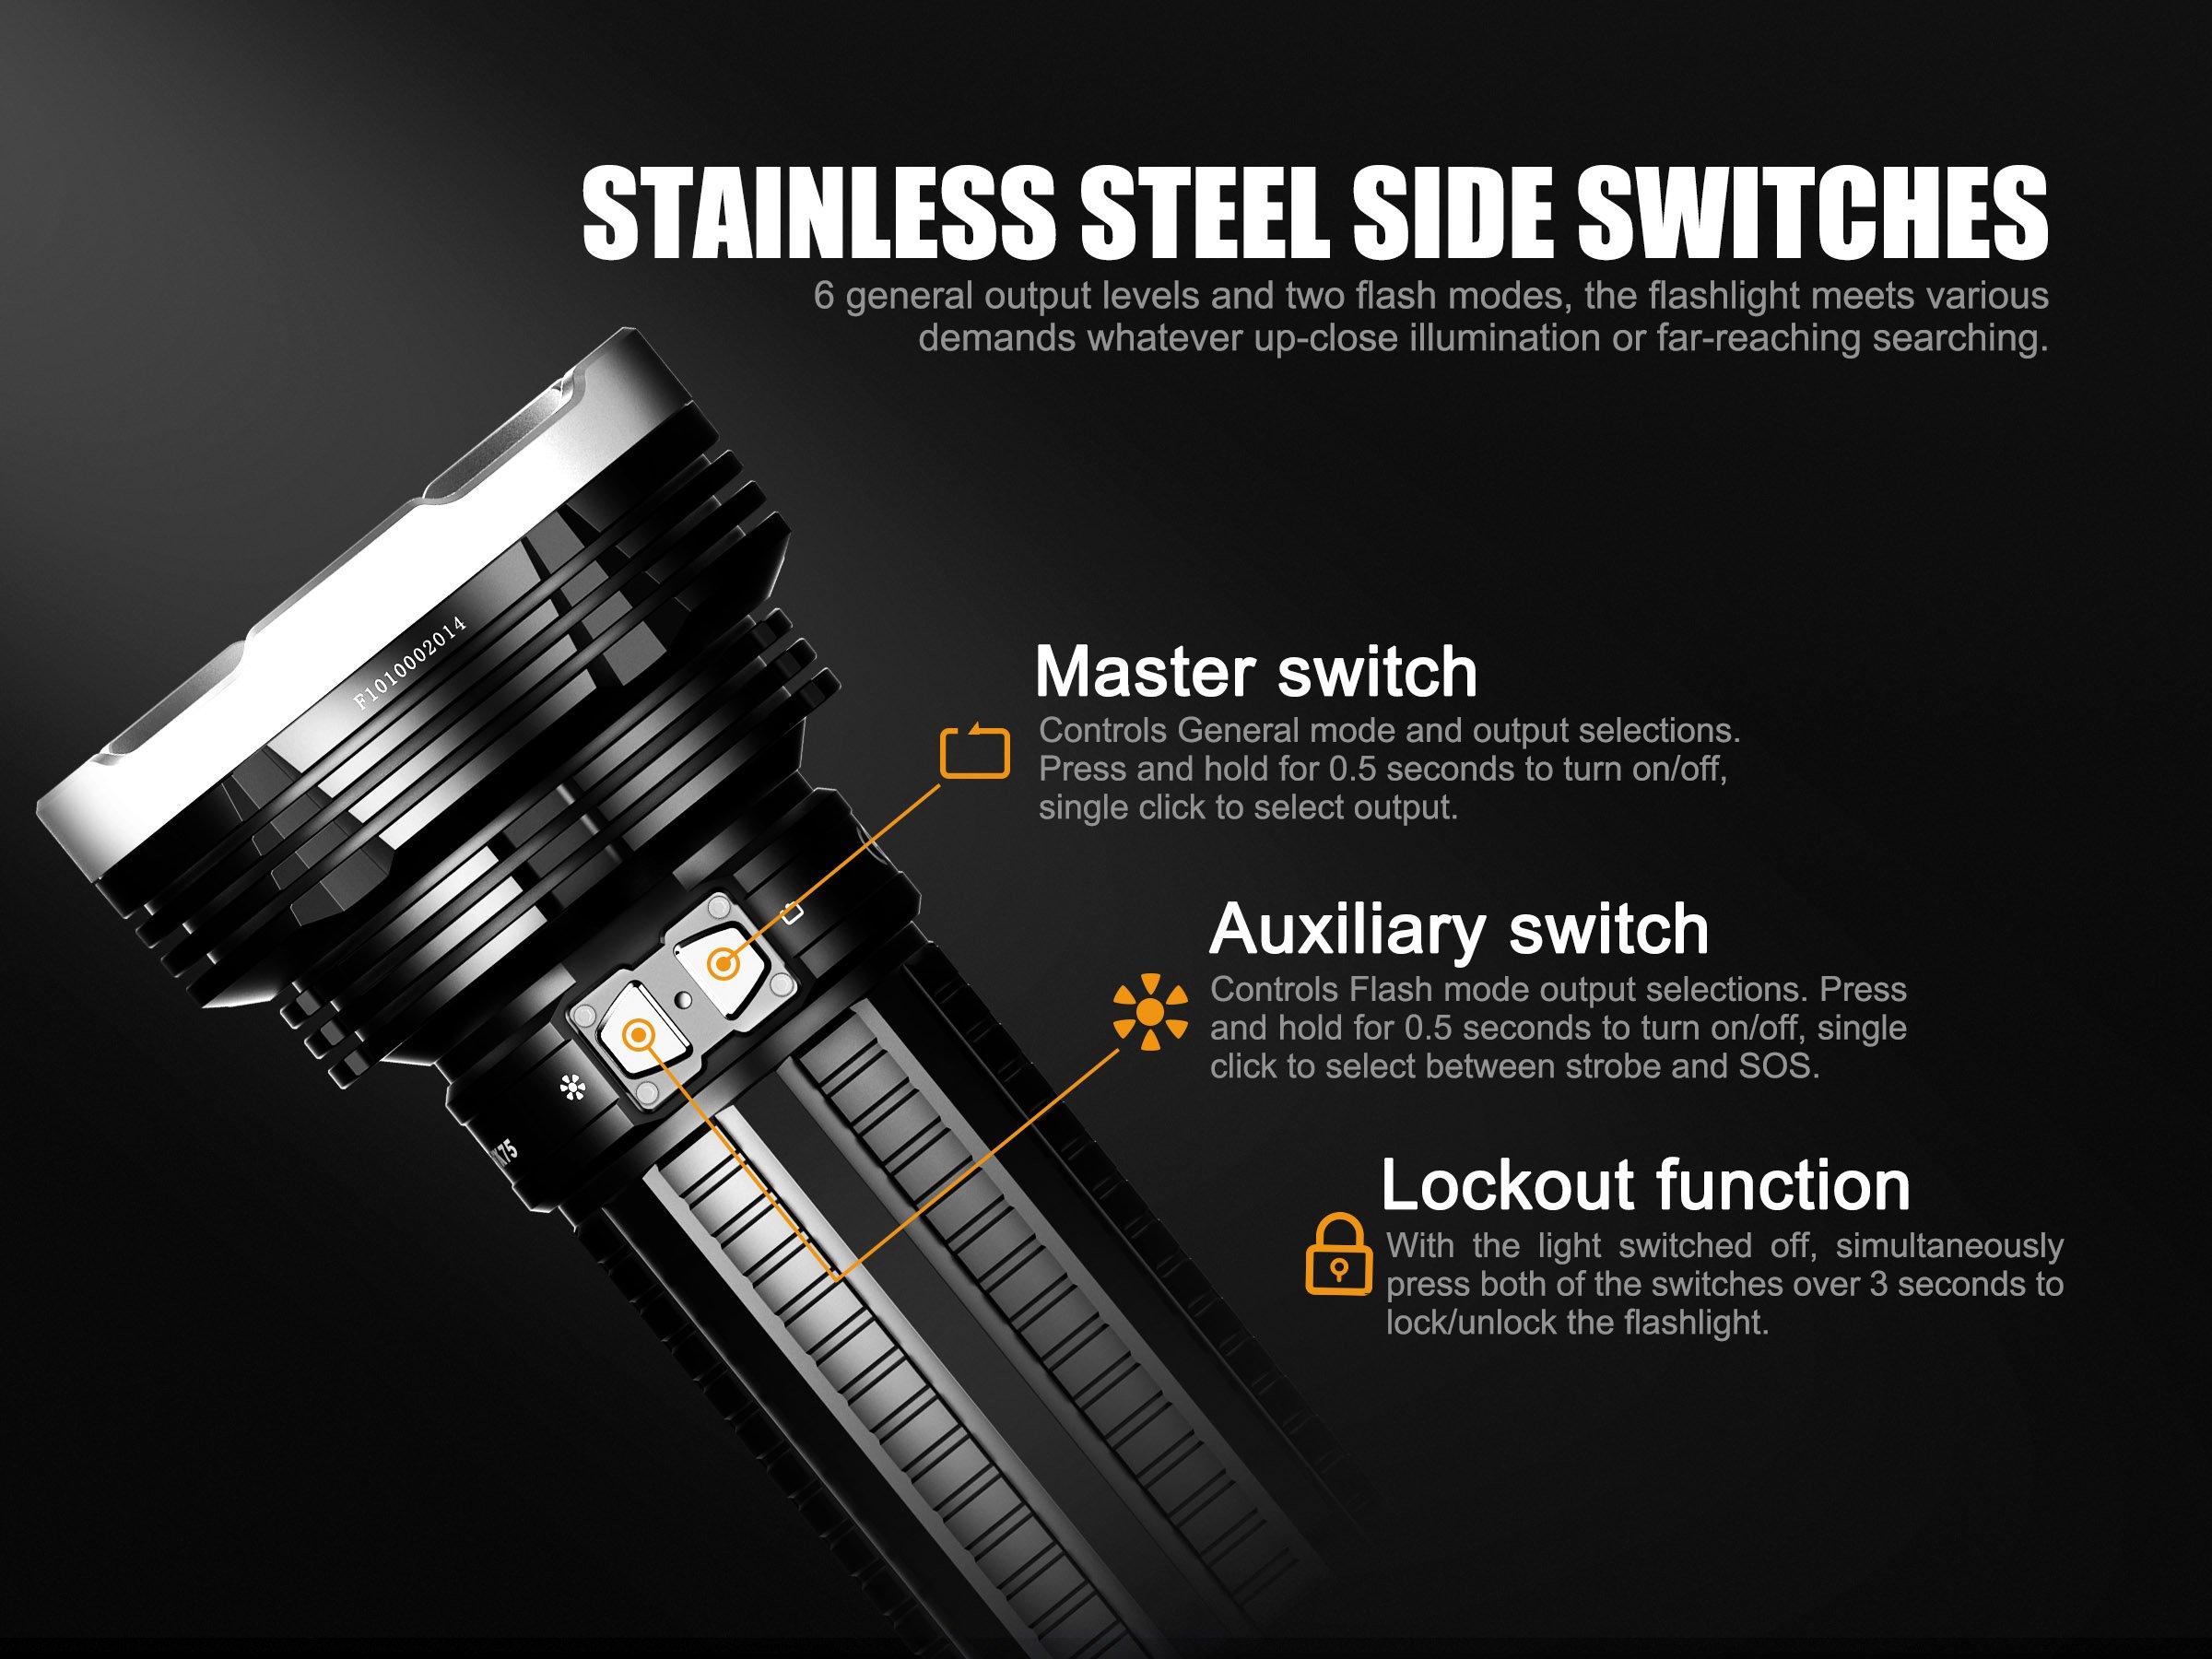 Fenix TK75 2018 5100 Lumens High-Performance Long-Throw Micro-USB Rechargeable Flashlight, 4x 3500mAh 18650 Rechargeable Batteries, 2x Lumen Tactical Battery Organizers by Fenix (Image #5)